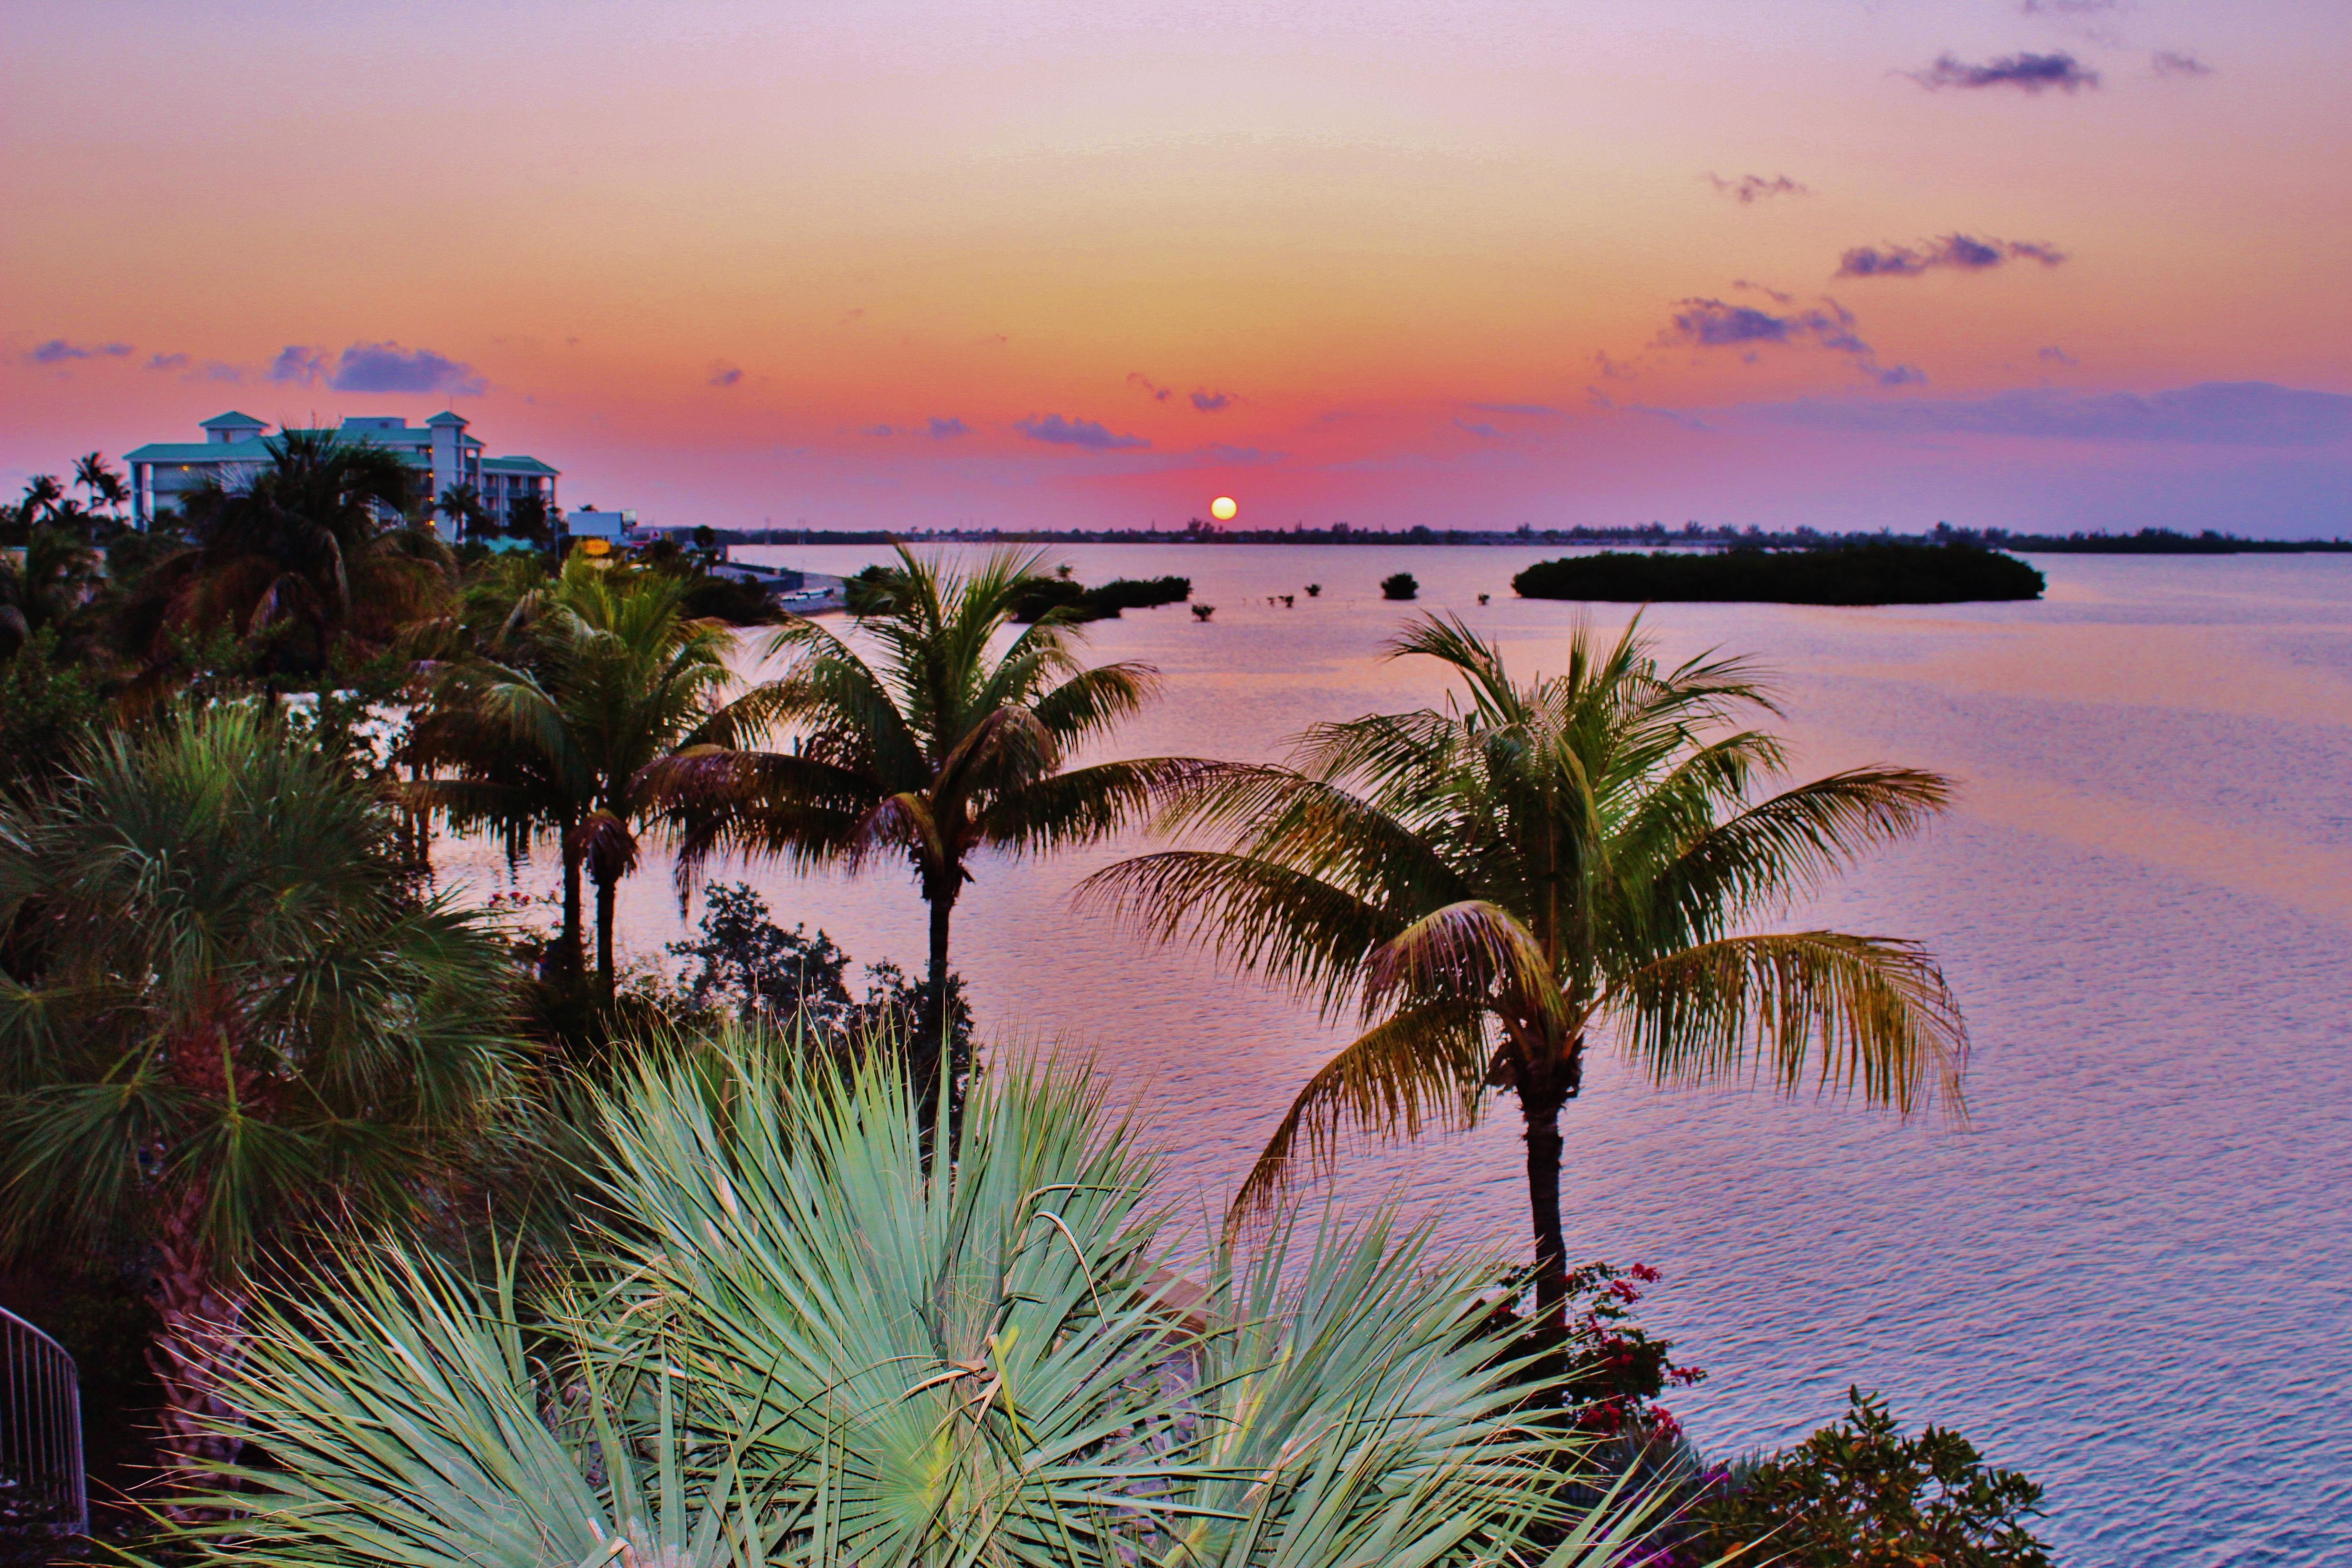 Free Images Beach Landscape Sea Coast Tree Ocean Sky Sunrise Sunset Shore Vacation